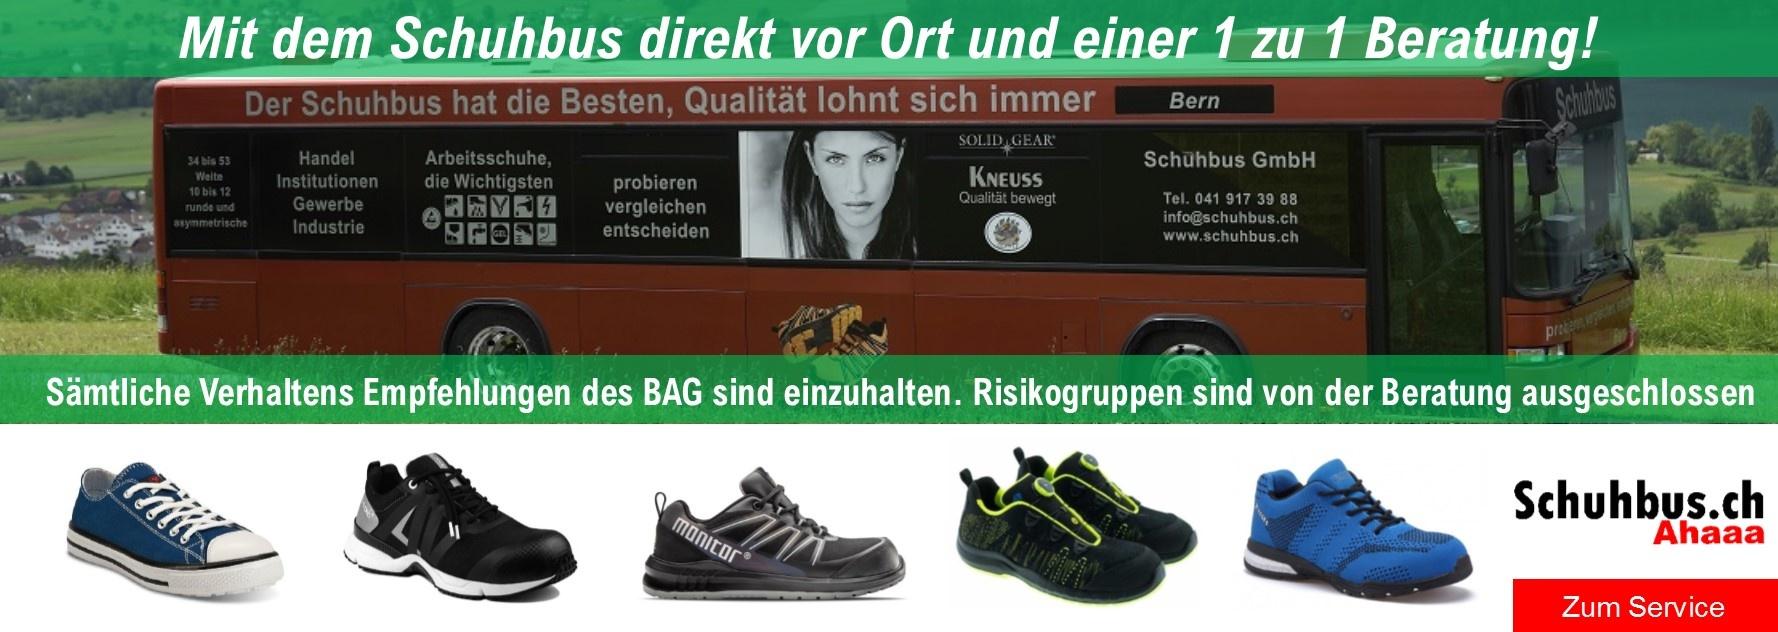 Schuhbus-Service